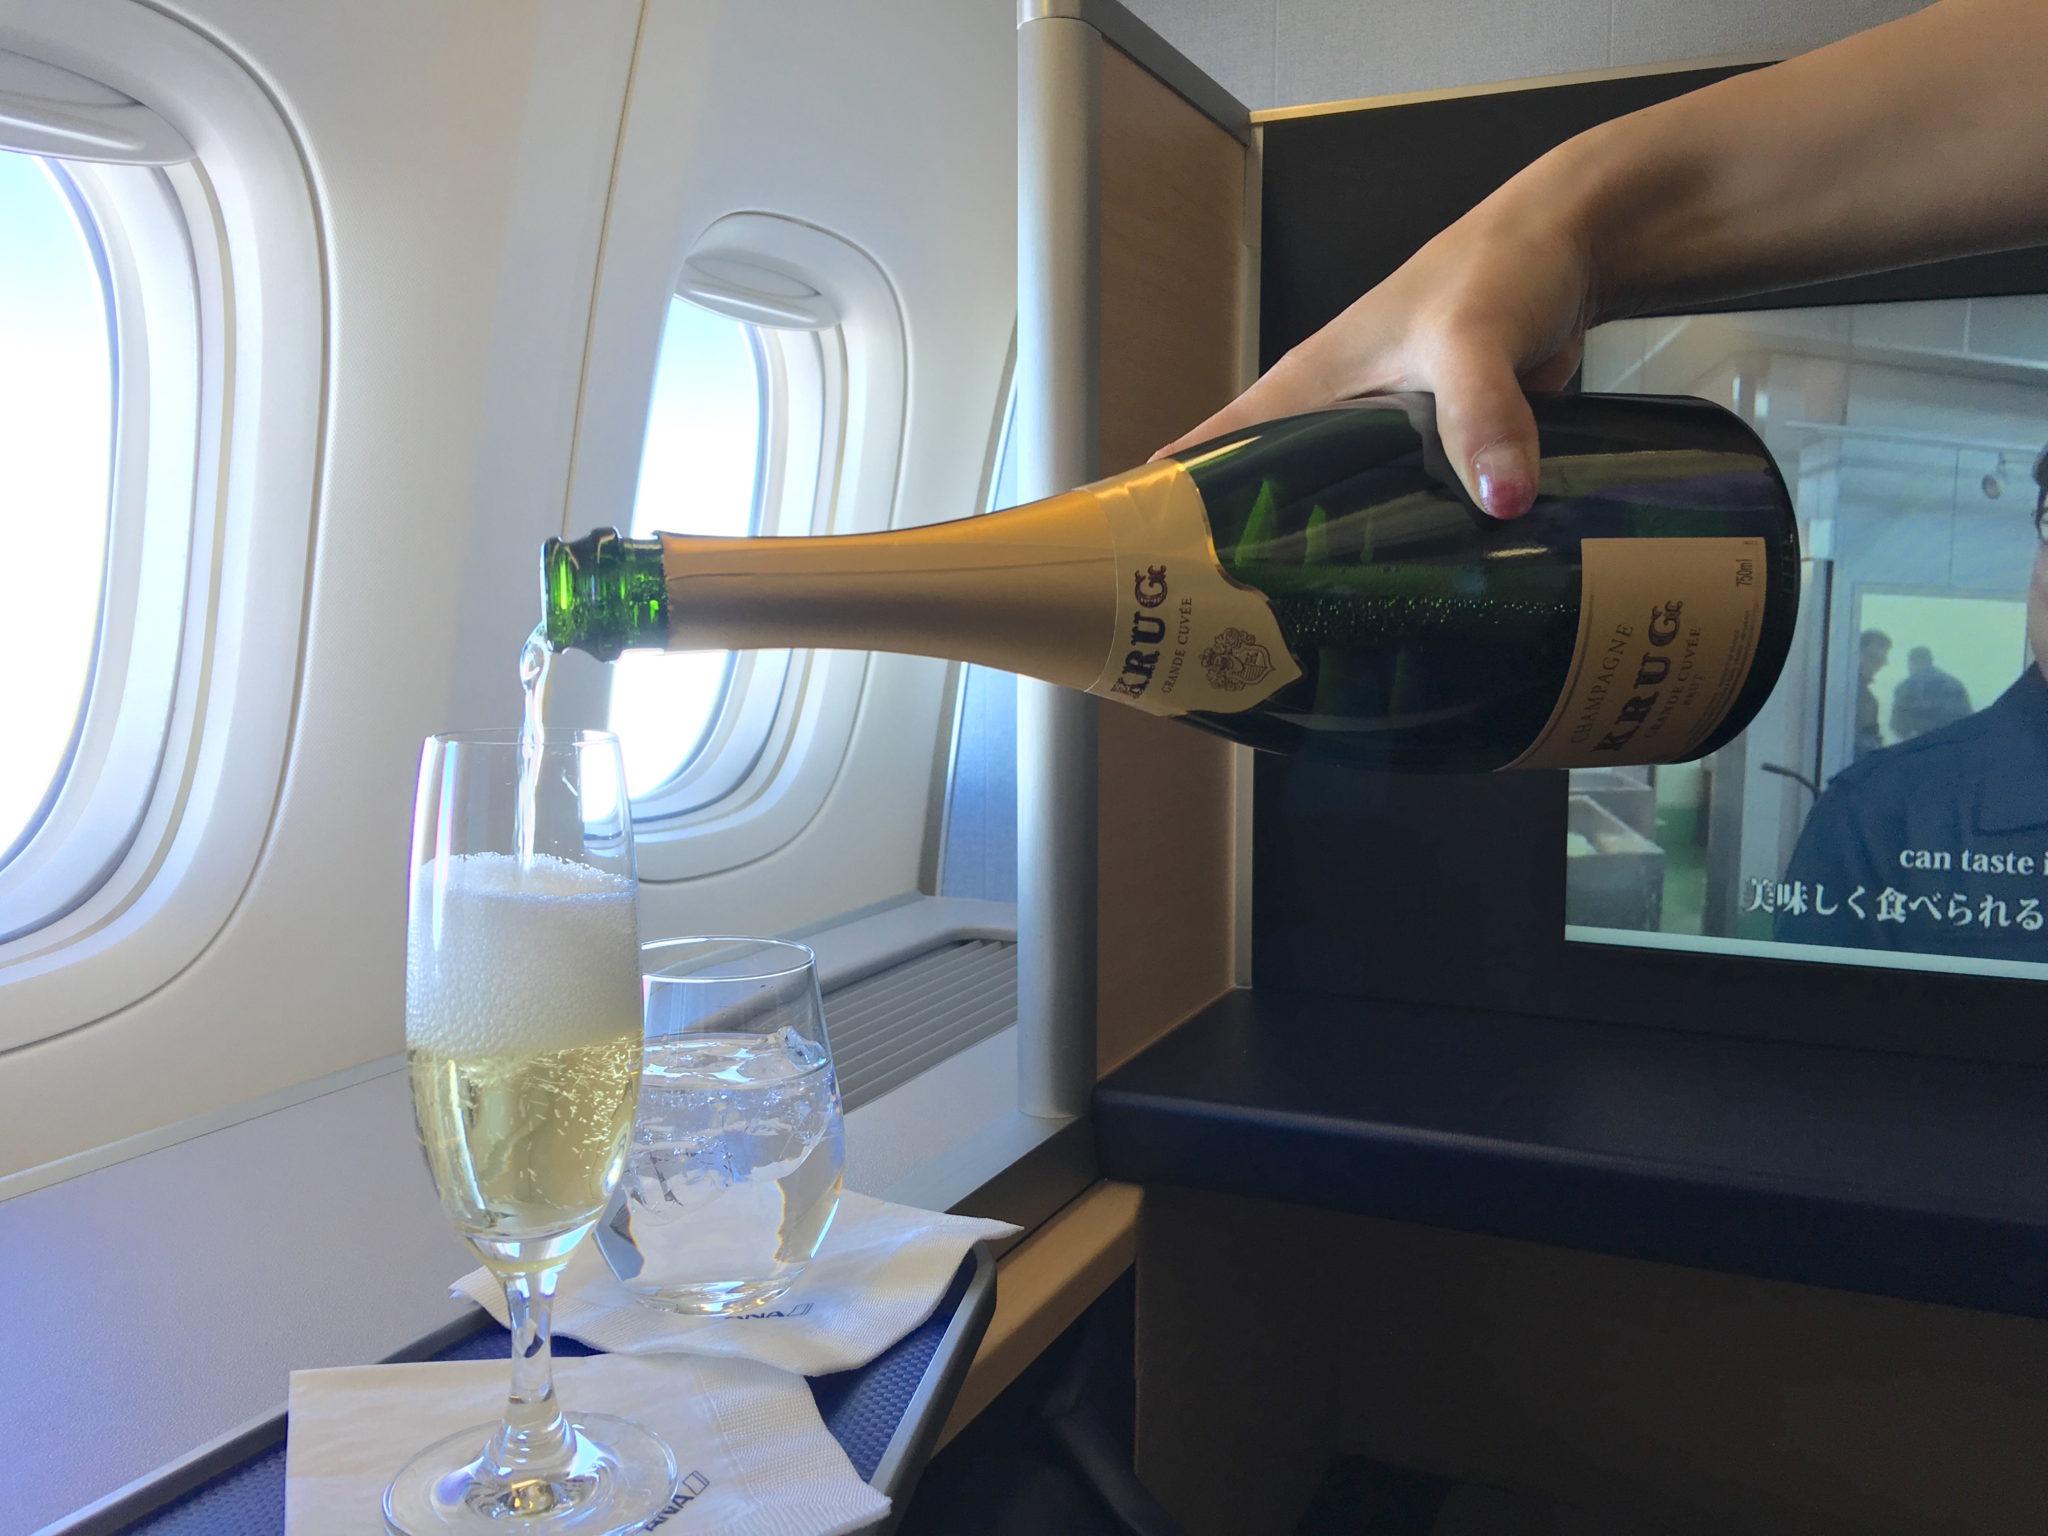 ANA's house first class Champagne is Krug. Image: John Walton